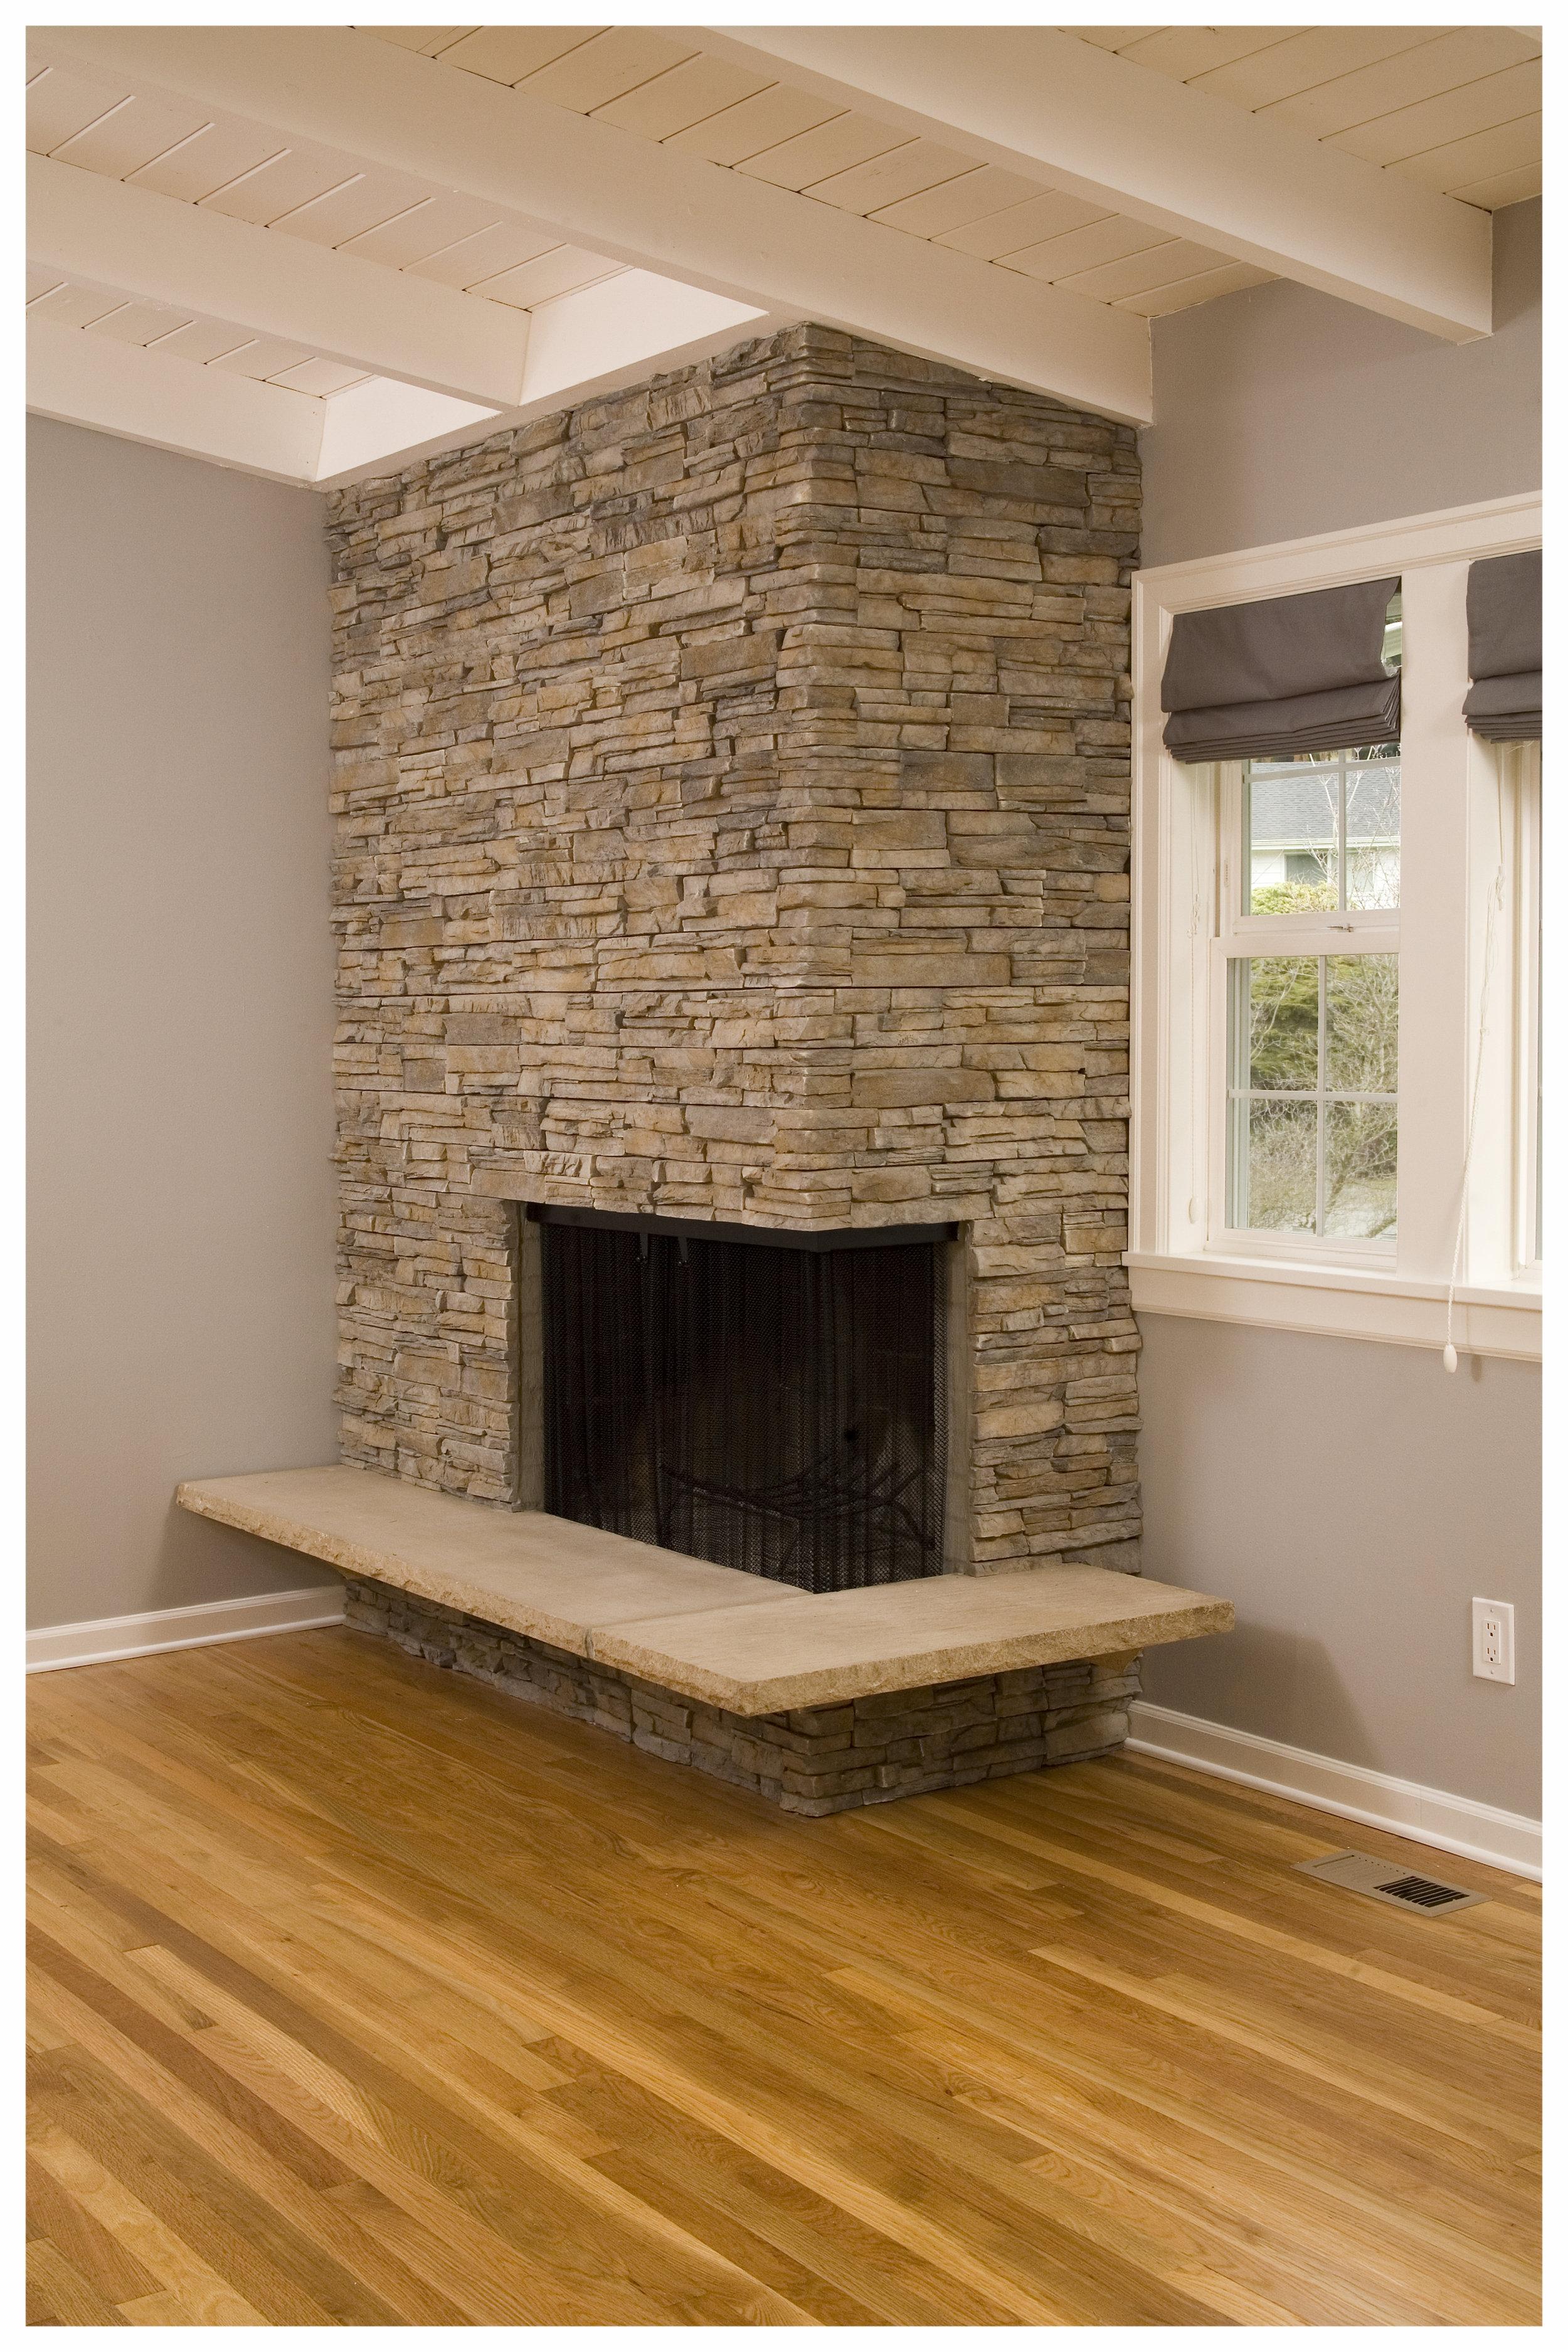 Fireplace 7.jpg